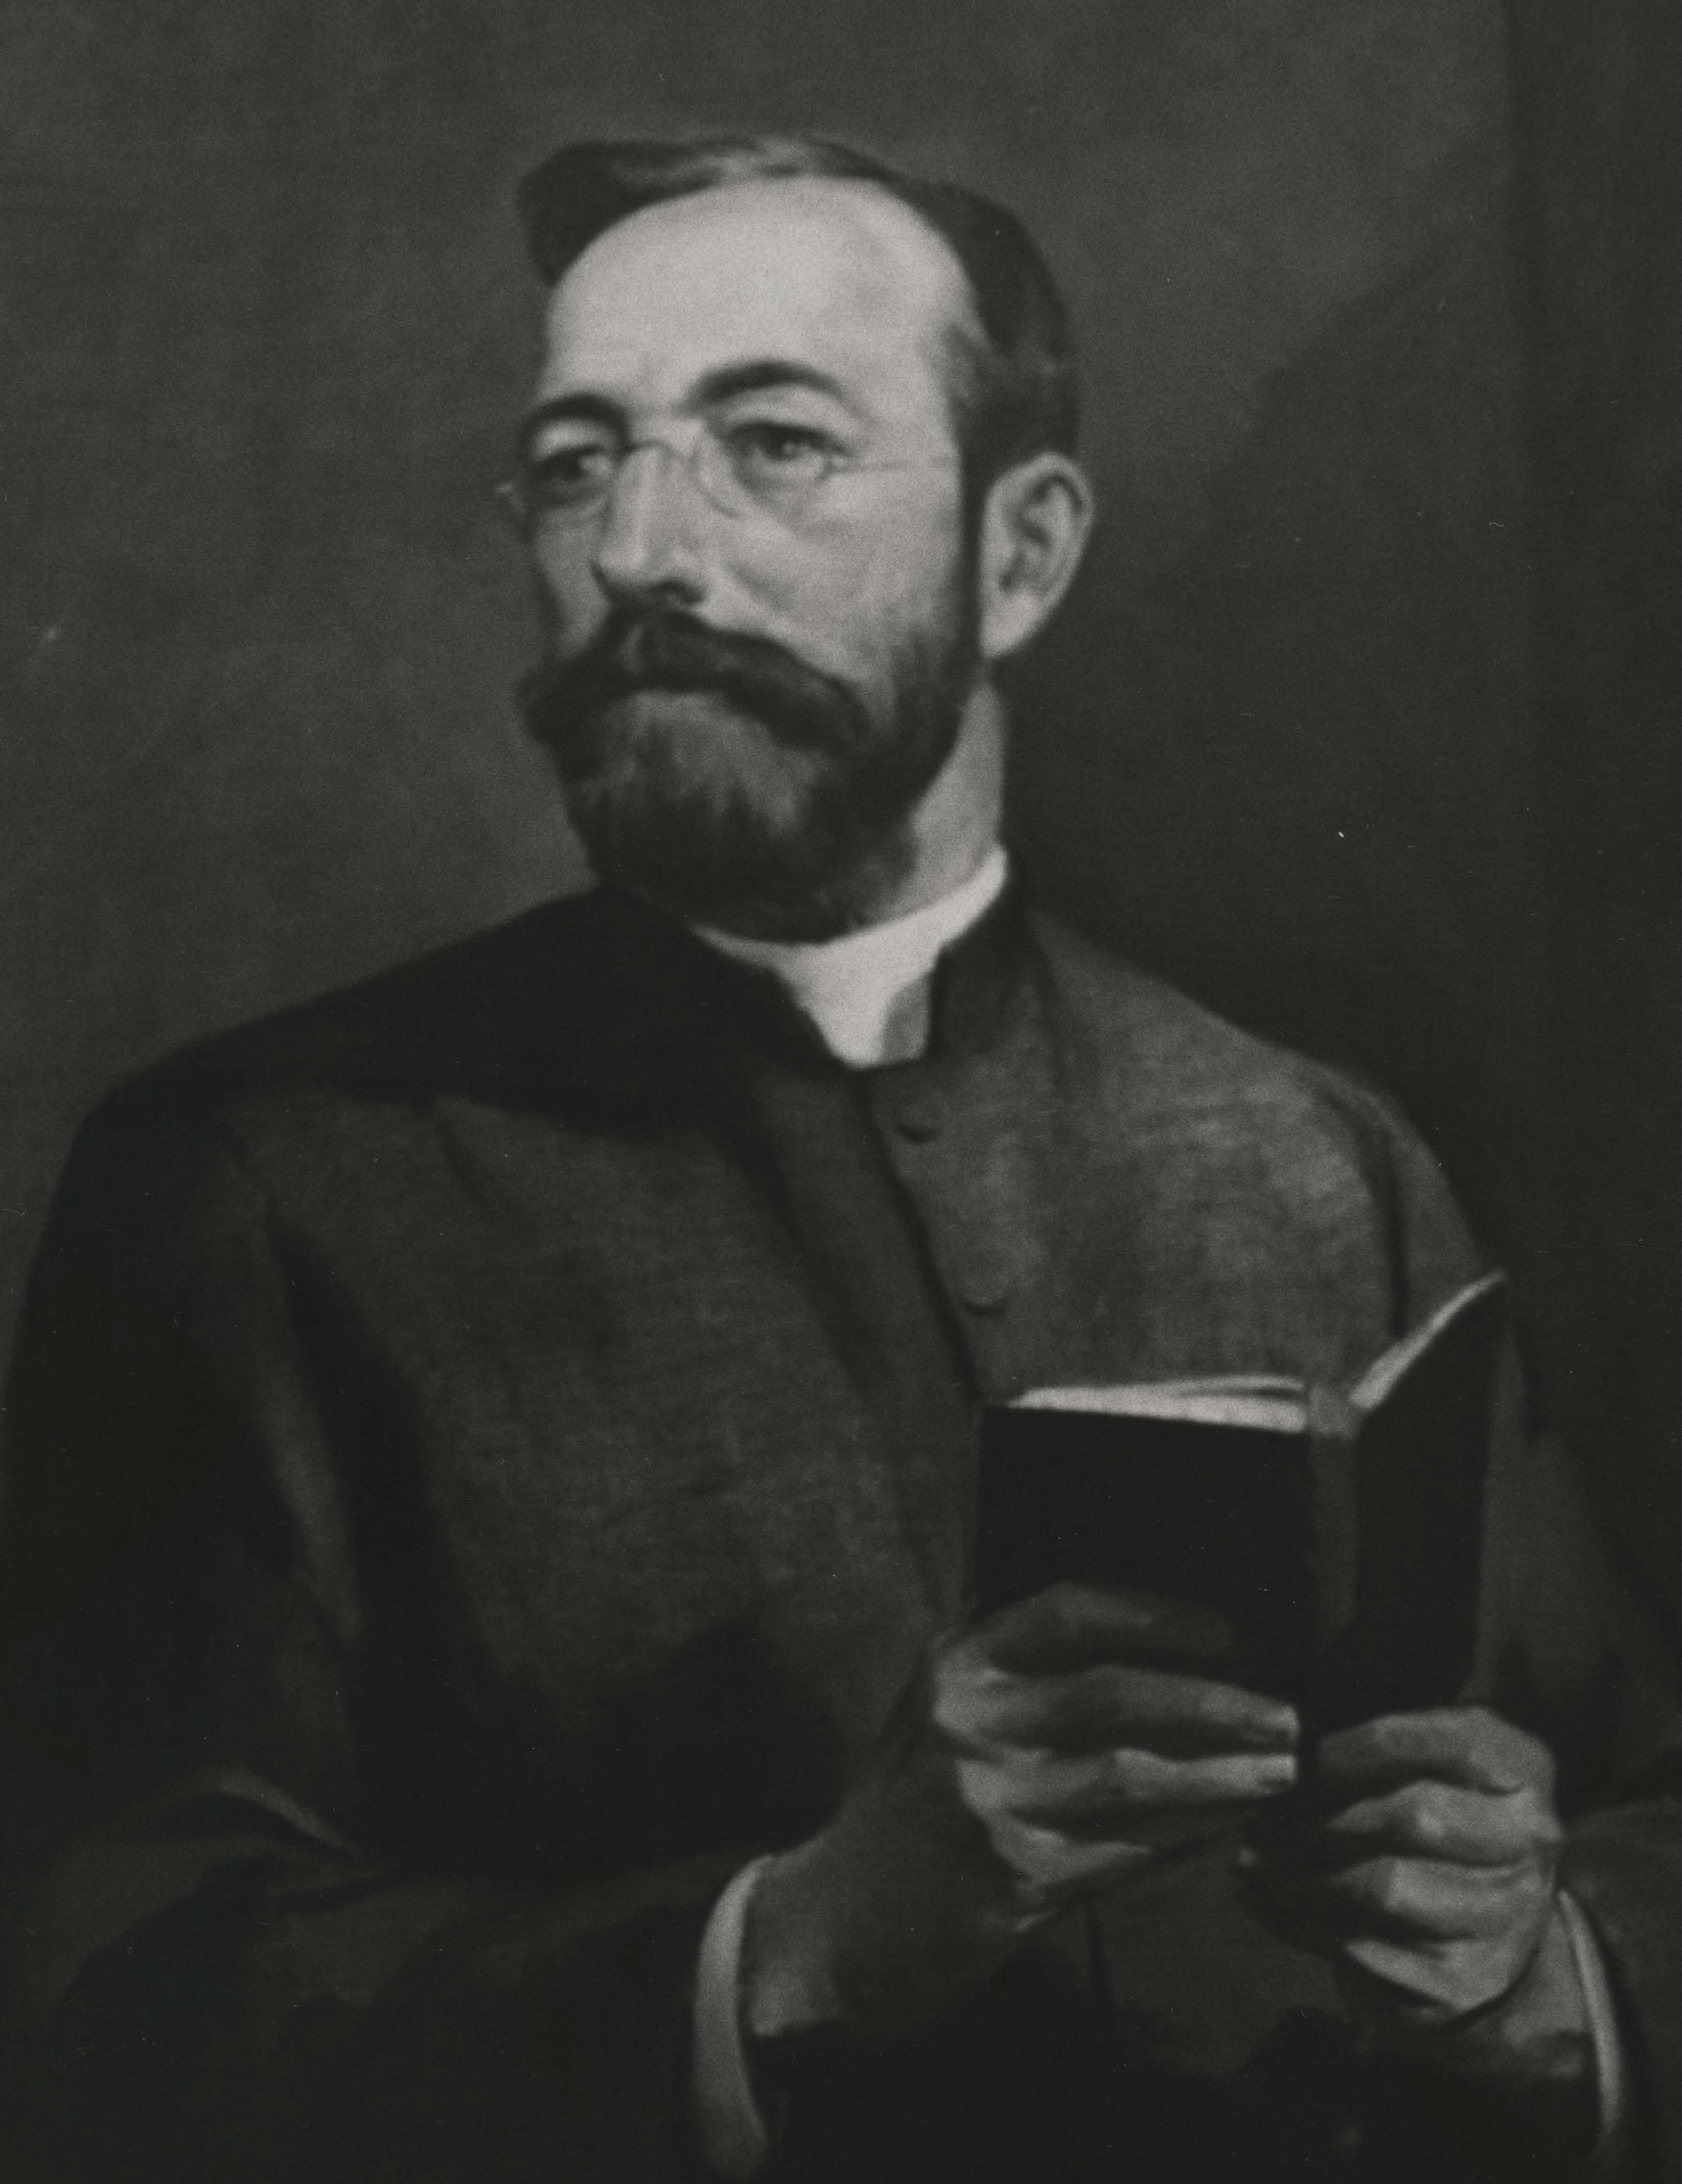 Thomas Edward Shields